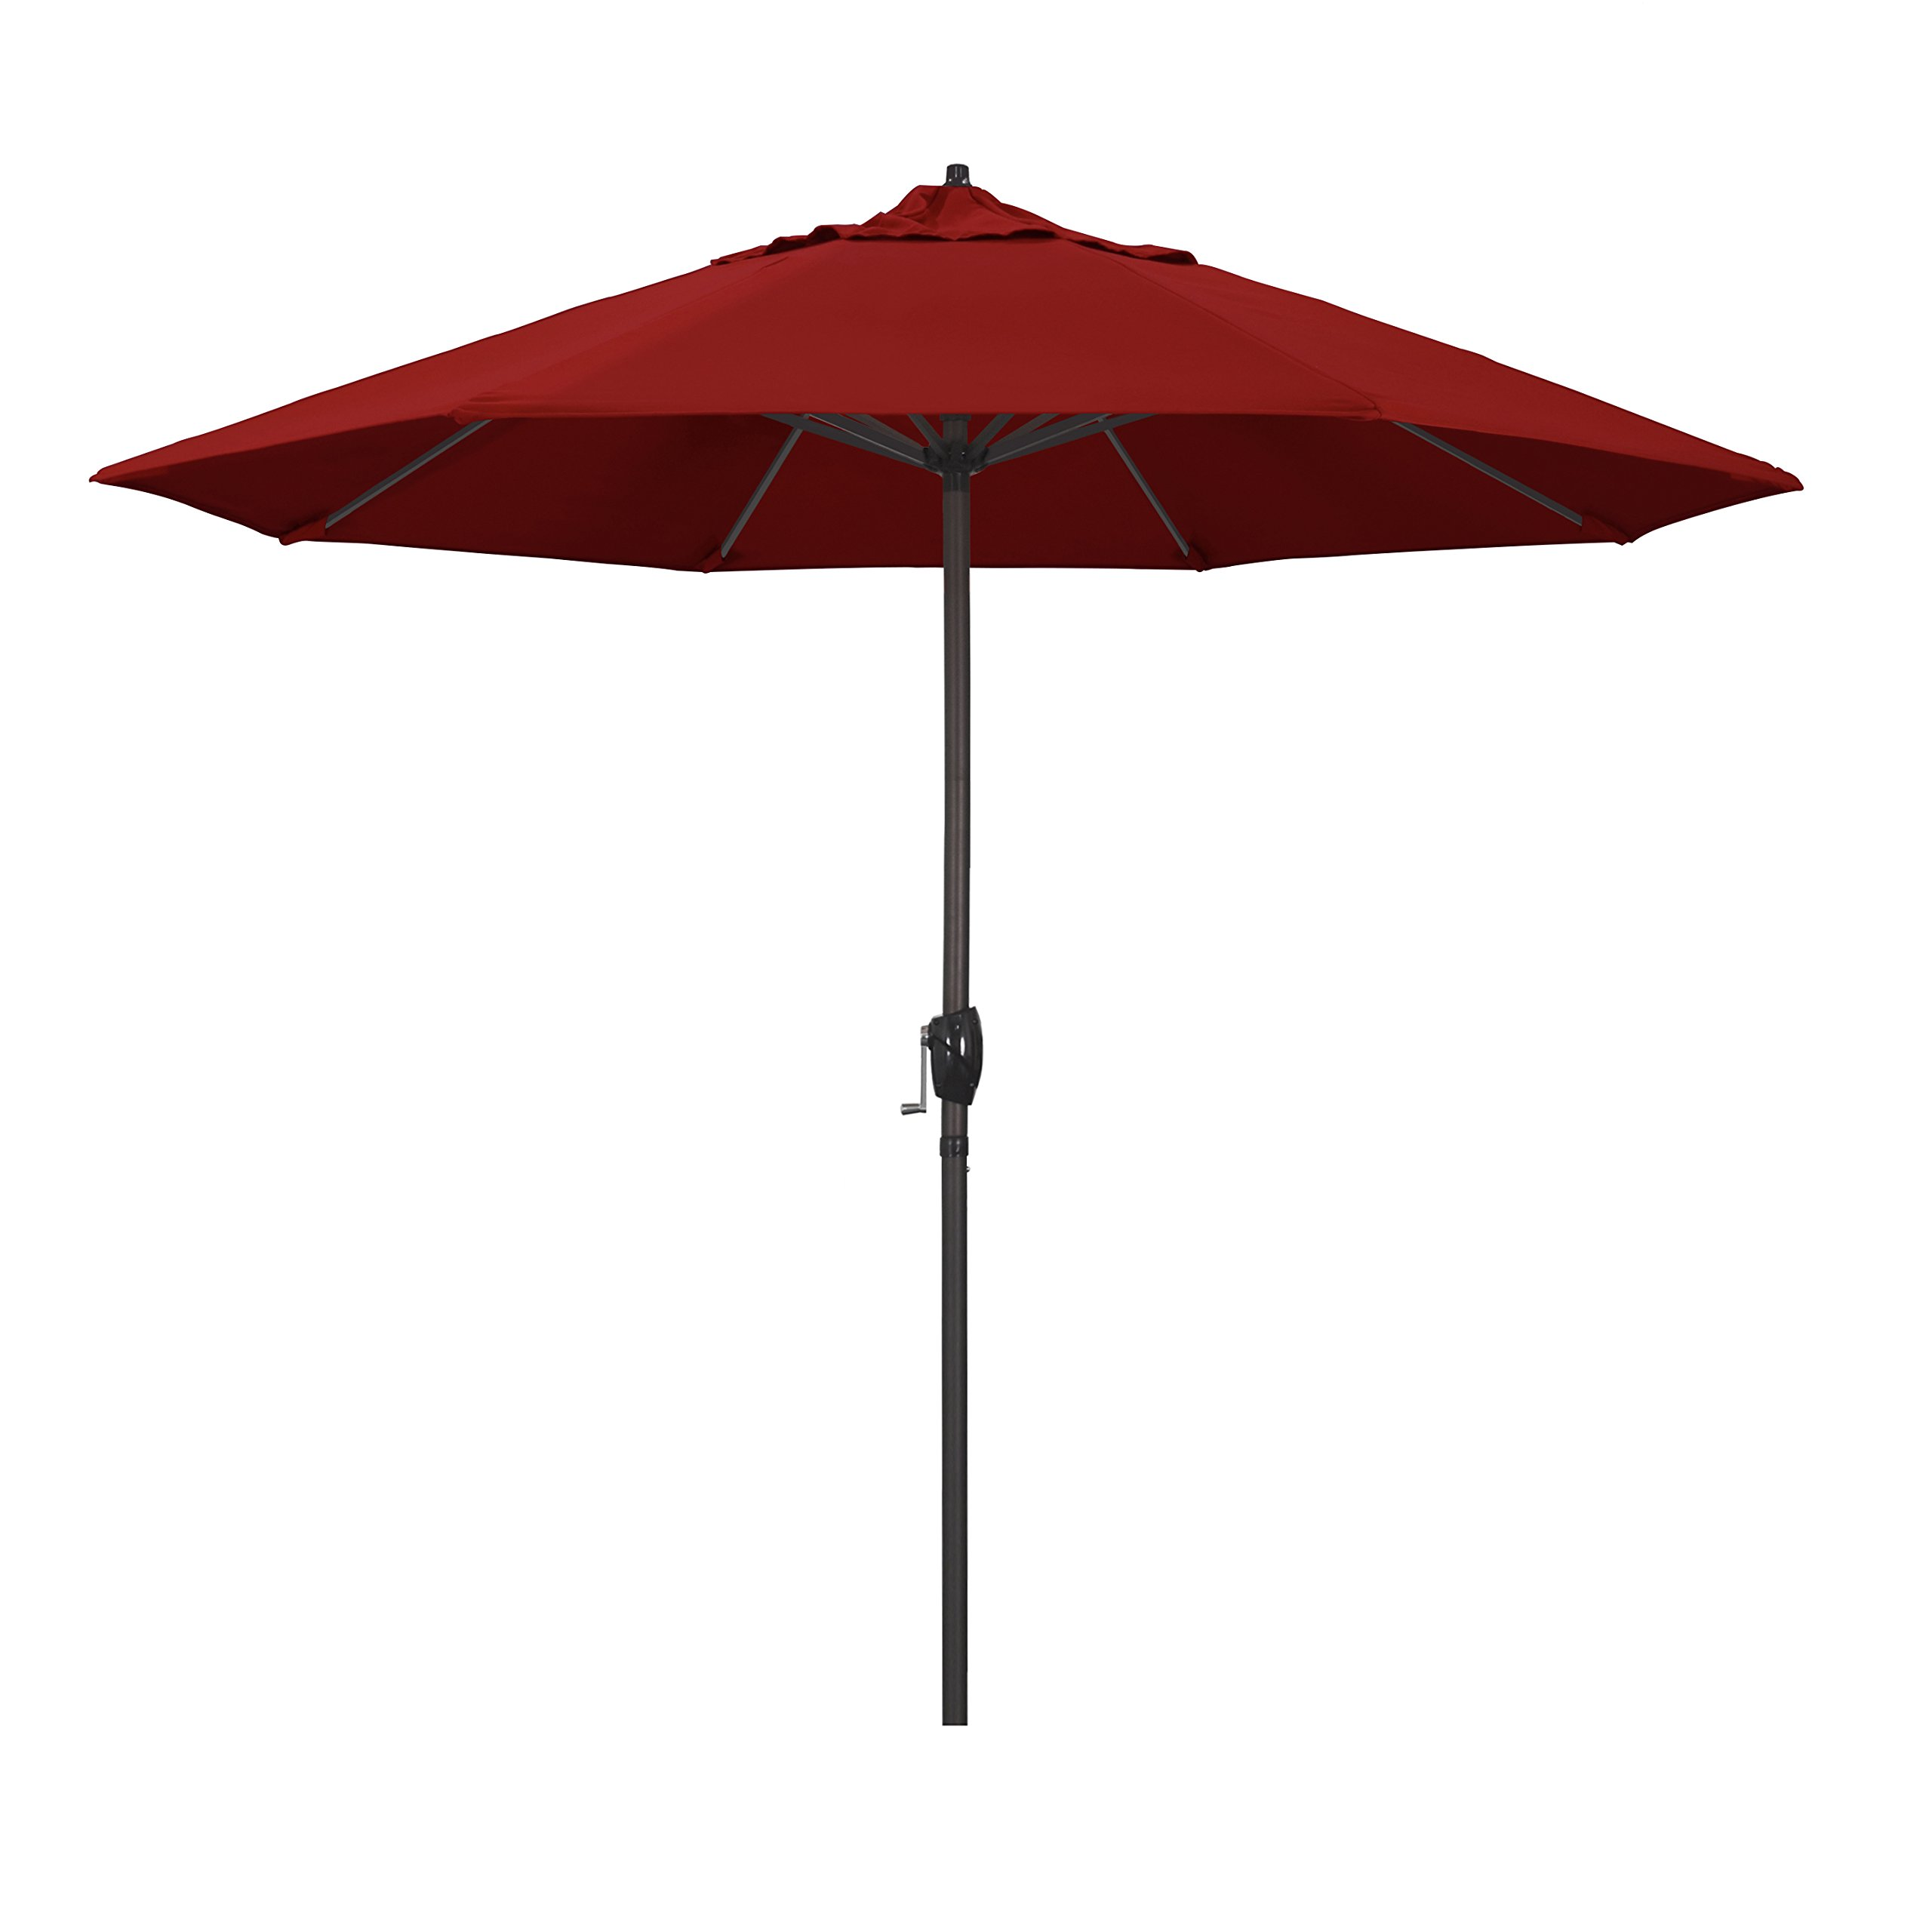 California Umbrella 9' Round Aluminum Market Umbrella, Crank Lift, Auto Tilt, Bronze Pole, Sunbrella Jockey Red Fabric